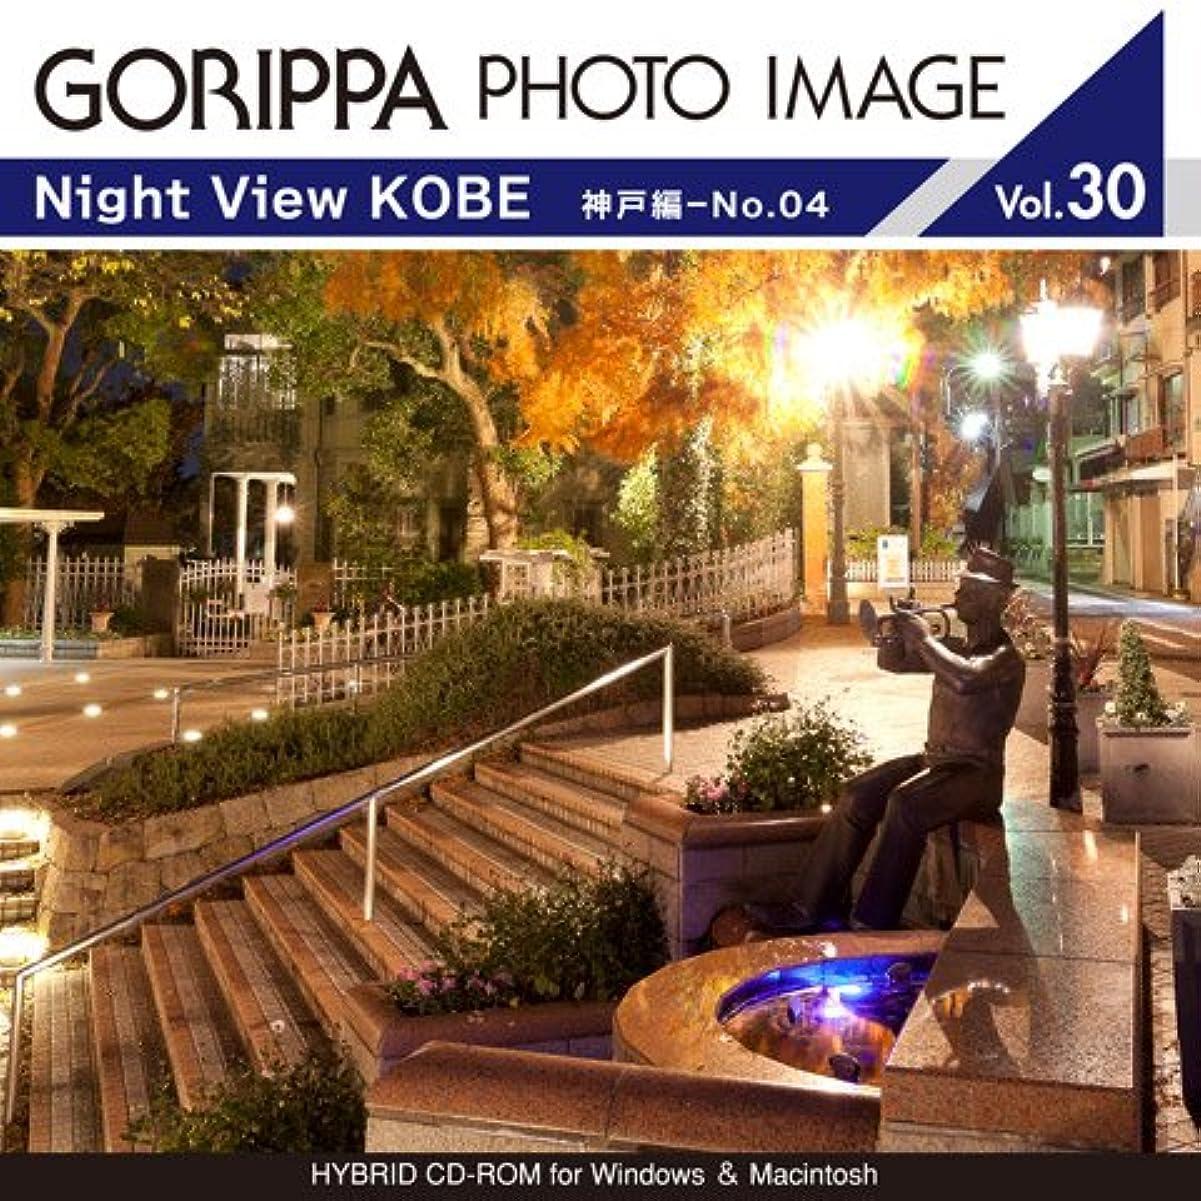 GORIPPA PHOTO IMAGE vol.30?Night View KOBE 神戸編-No.04?